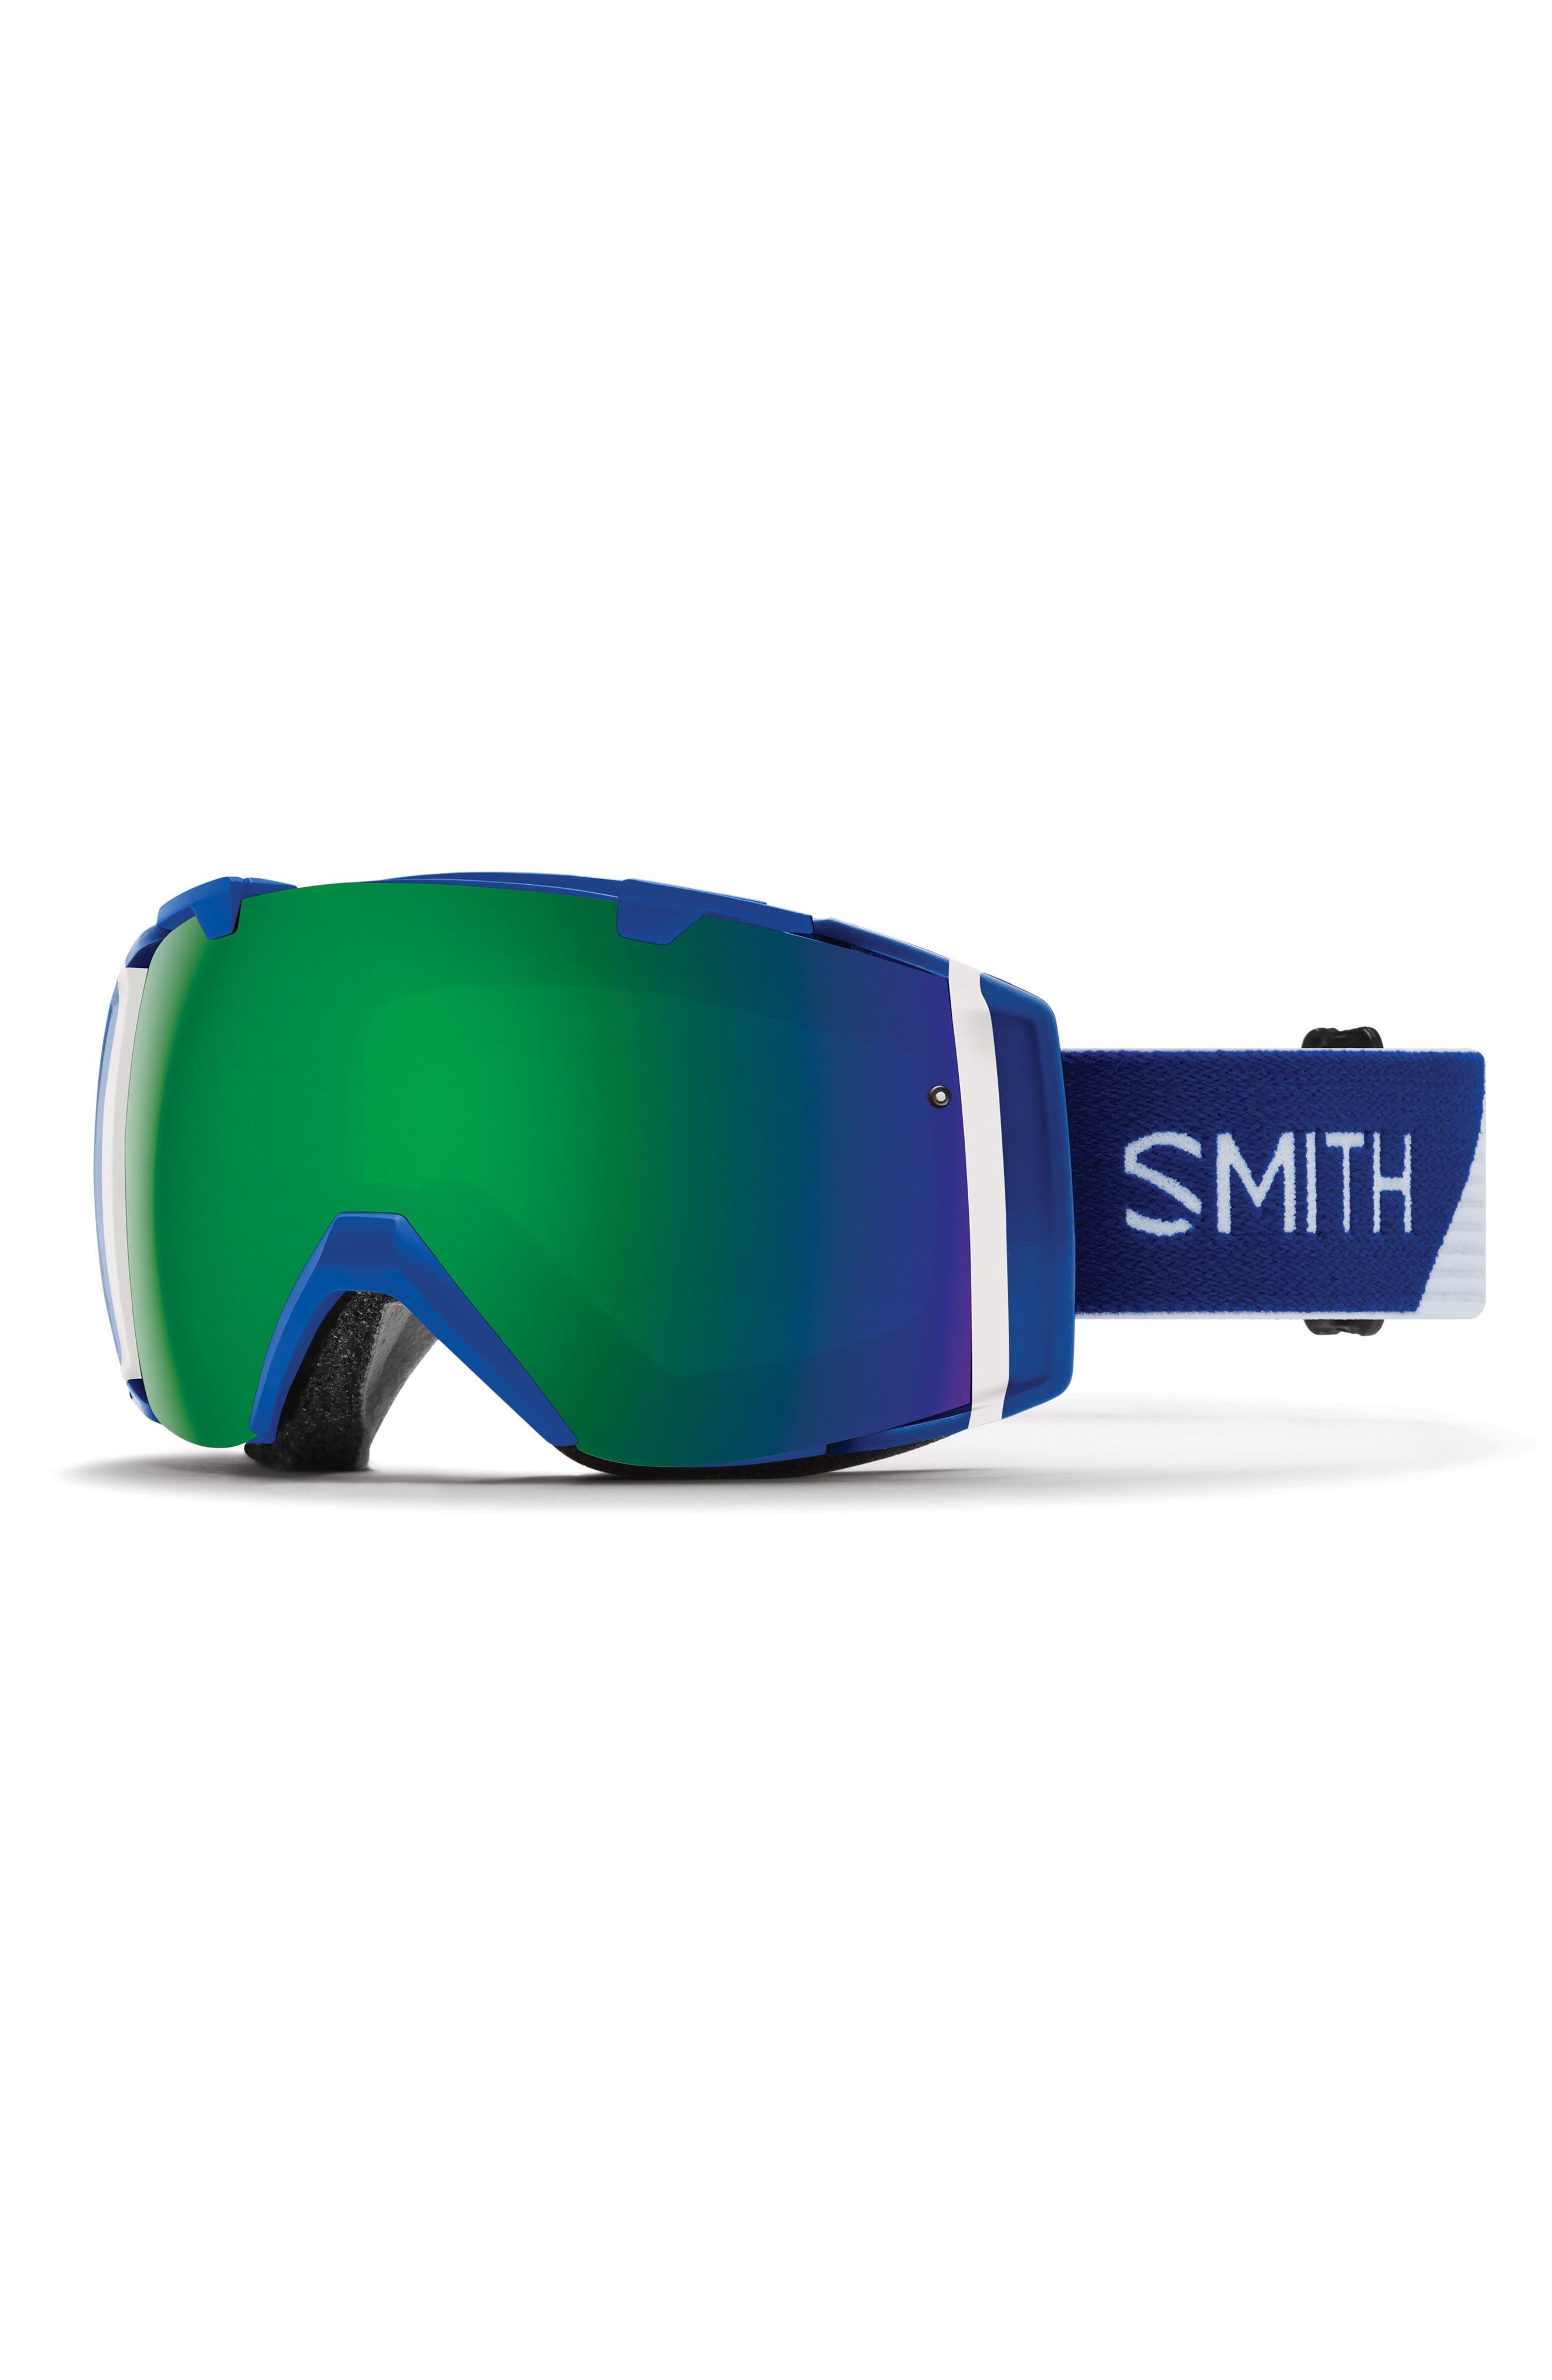 Main Image - Smith I/OX 205mm Chromapop Snow Goggles